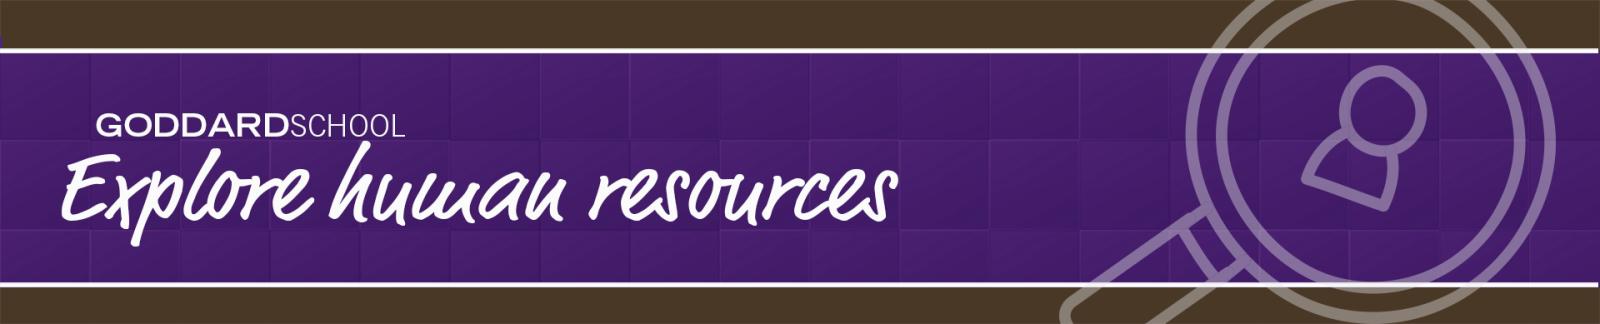 Explore human resources